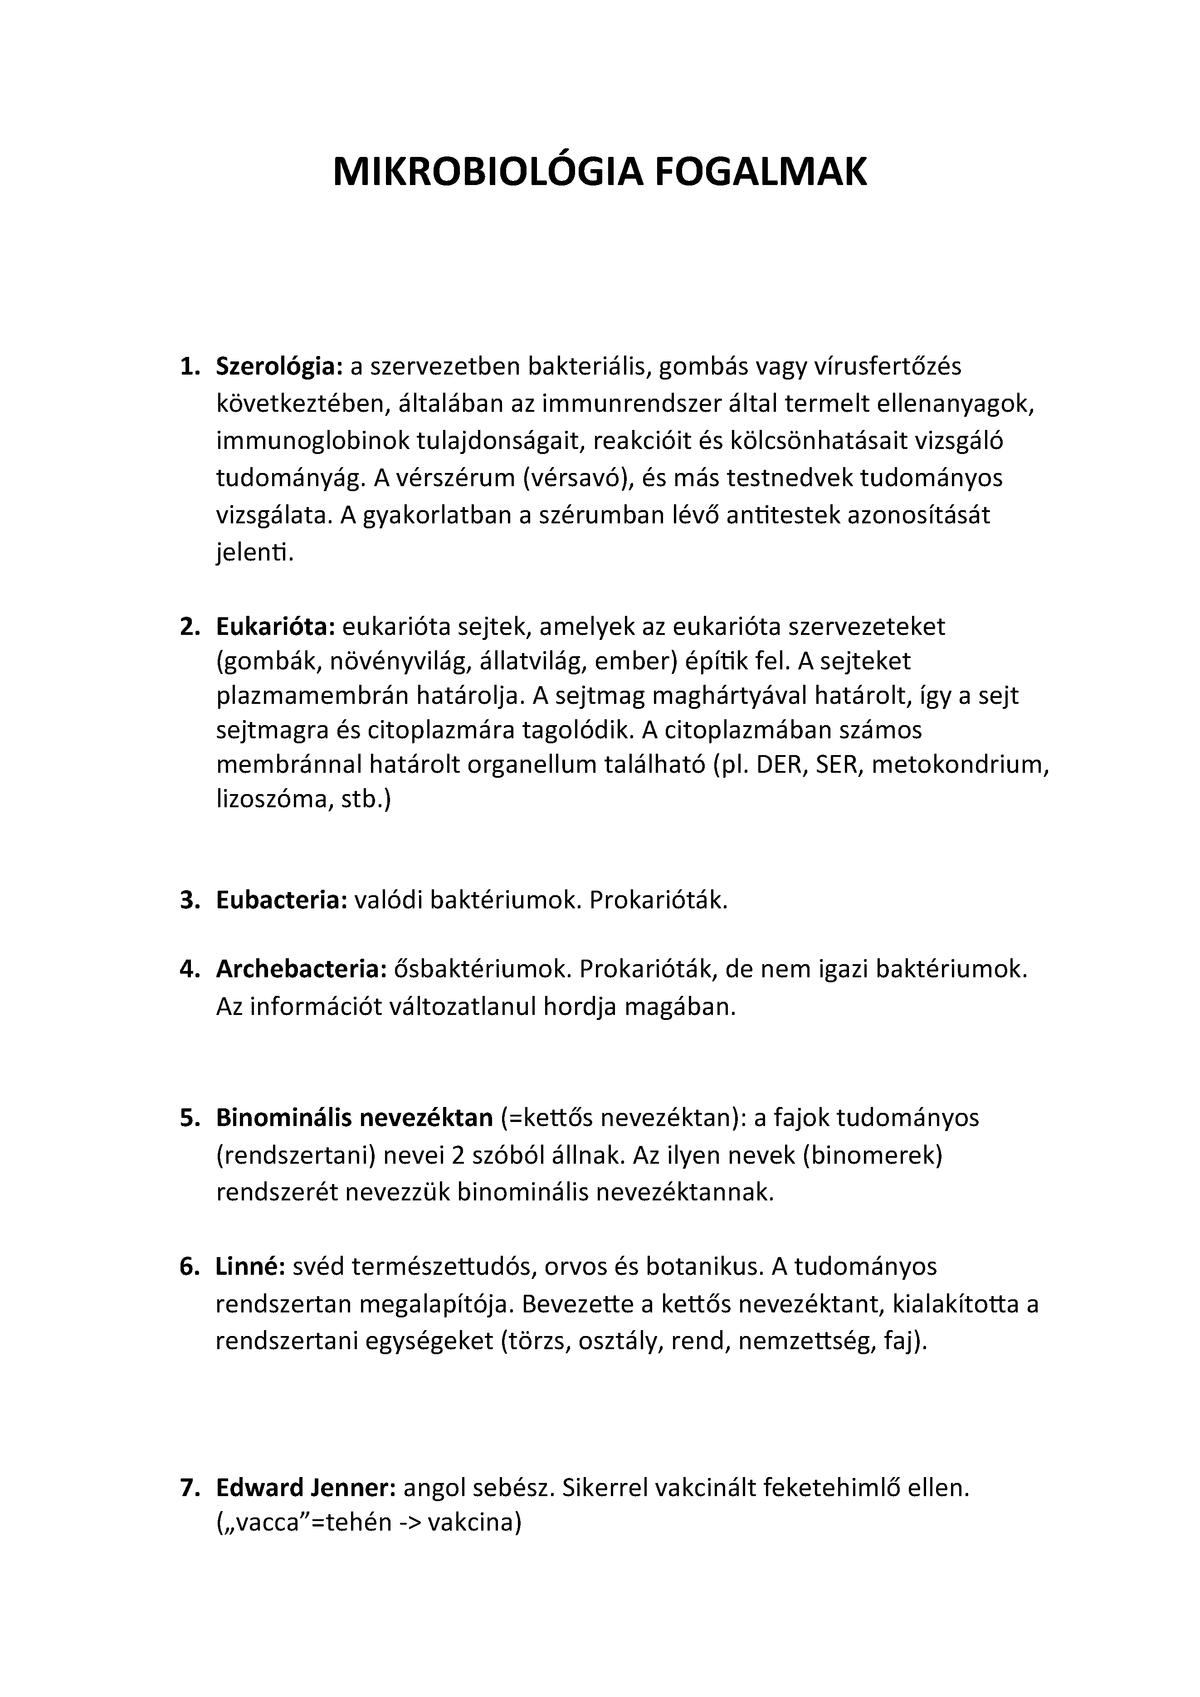 Parasitologia hungarica